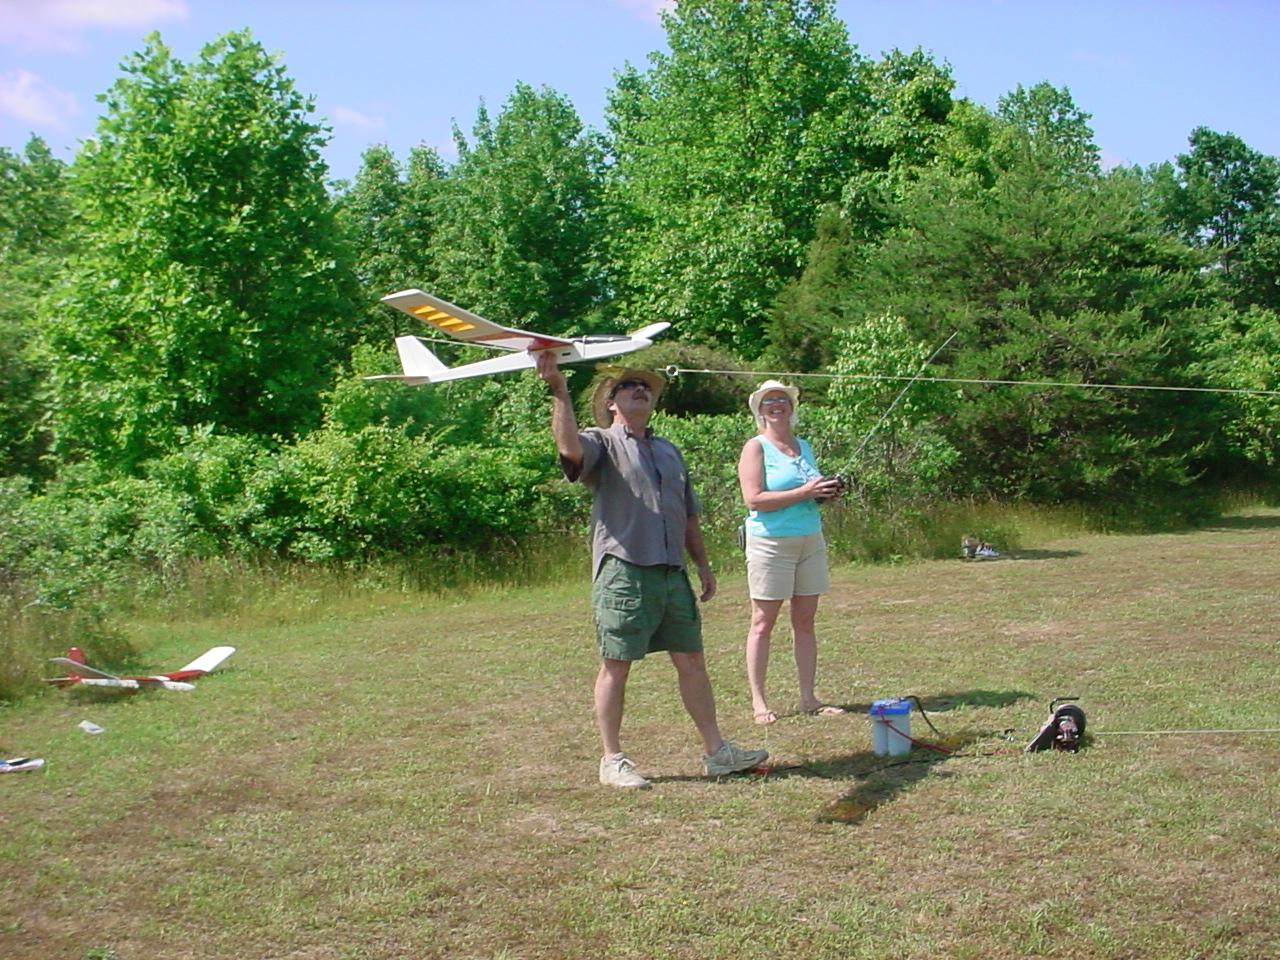 gliders-06-04-06-09